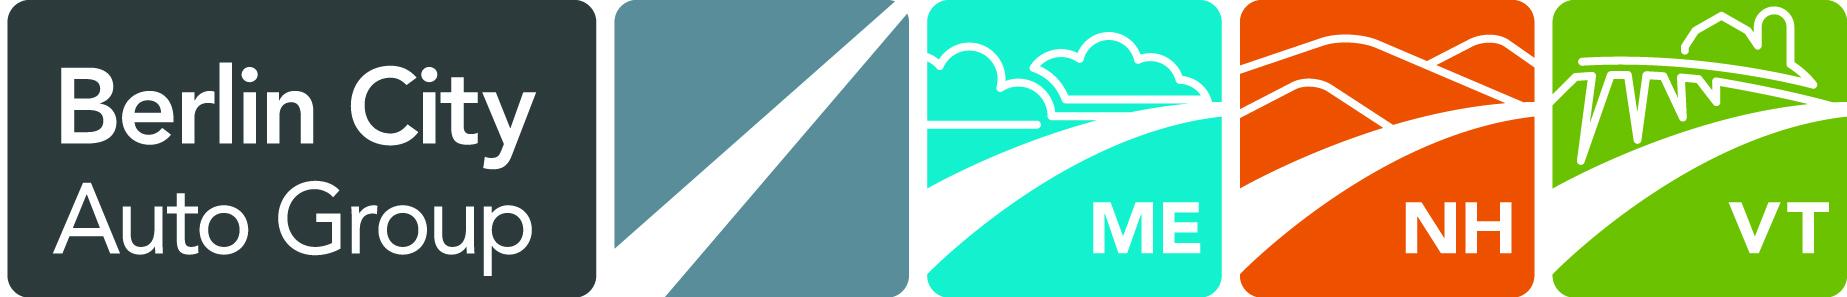 berlin-city-logo.jpg